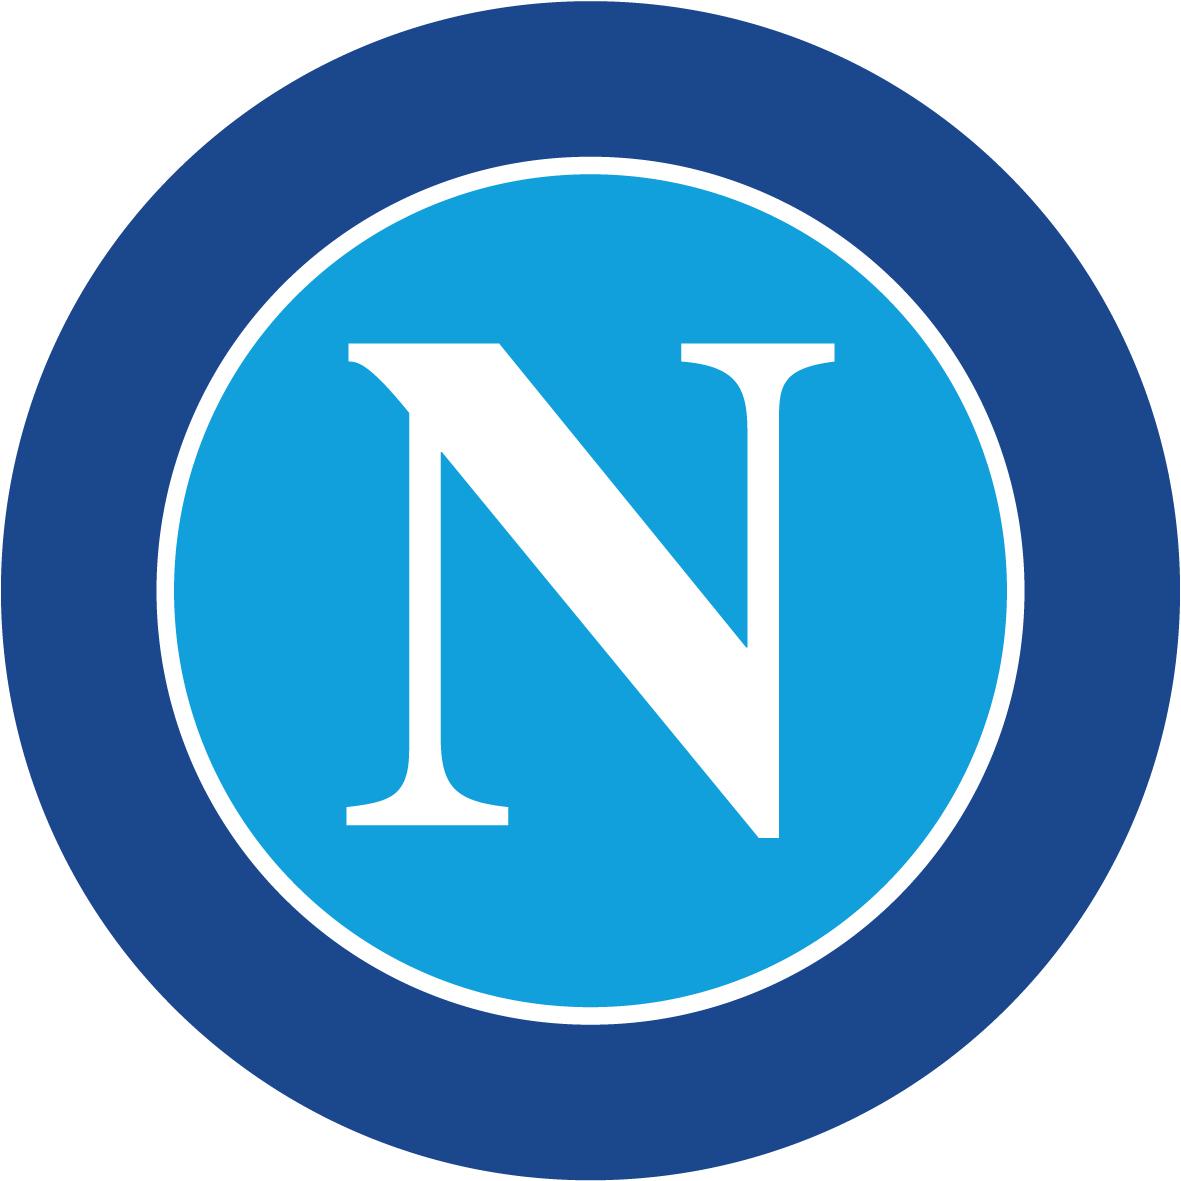 SSC Napoli Symbol wallpapers HD